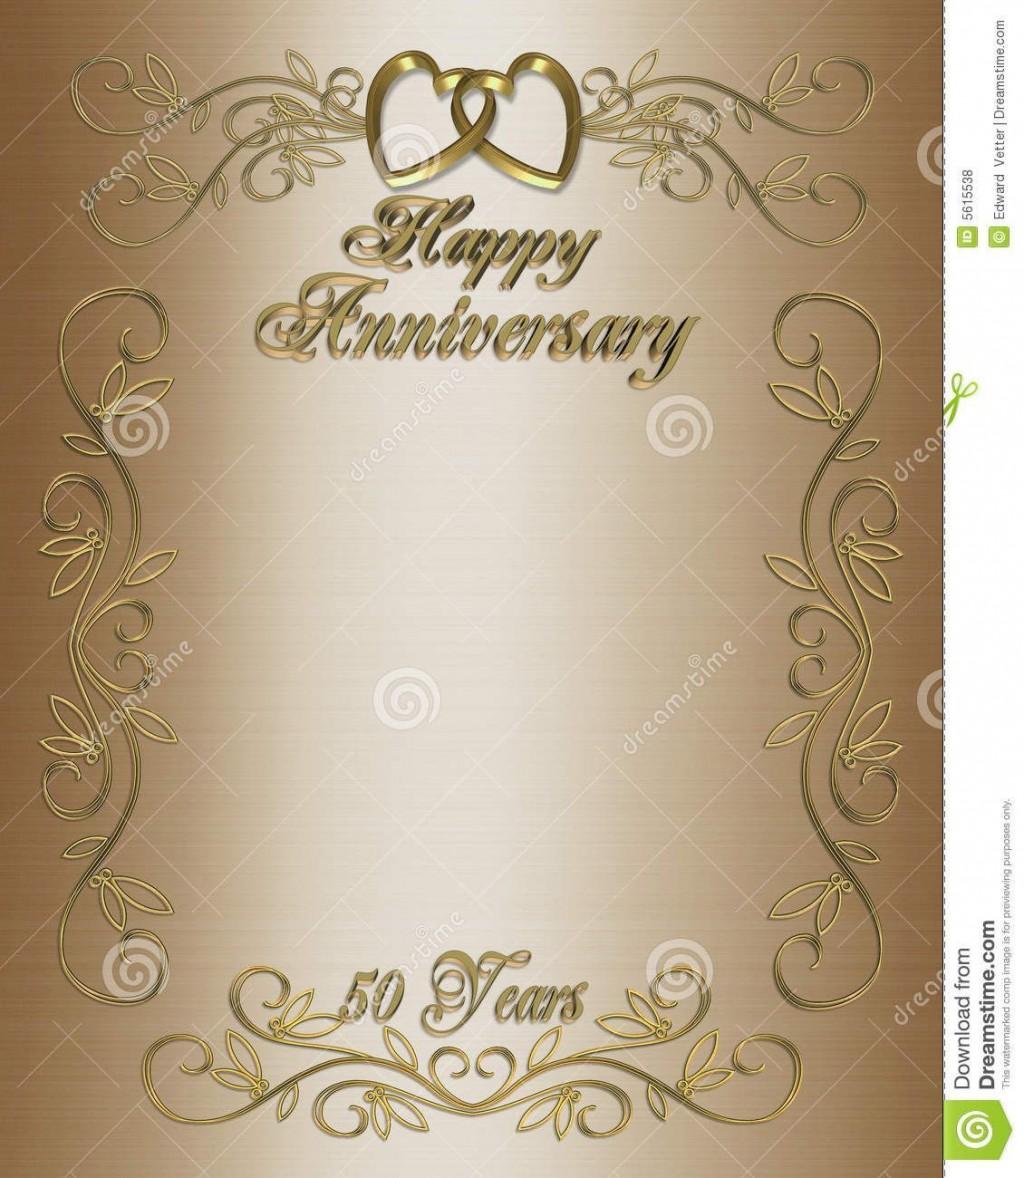 007 Stupendou 50th Anniversary Invitation Template Free High Resolution  Download Golden WeddingLarge